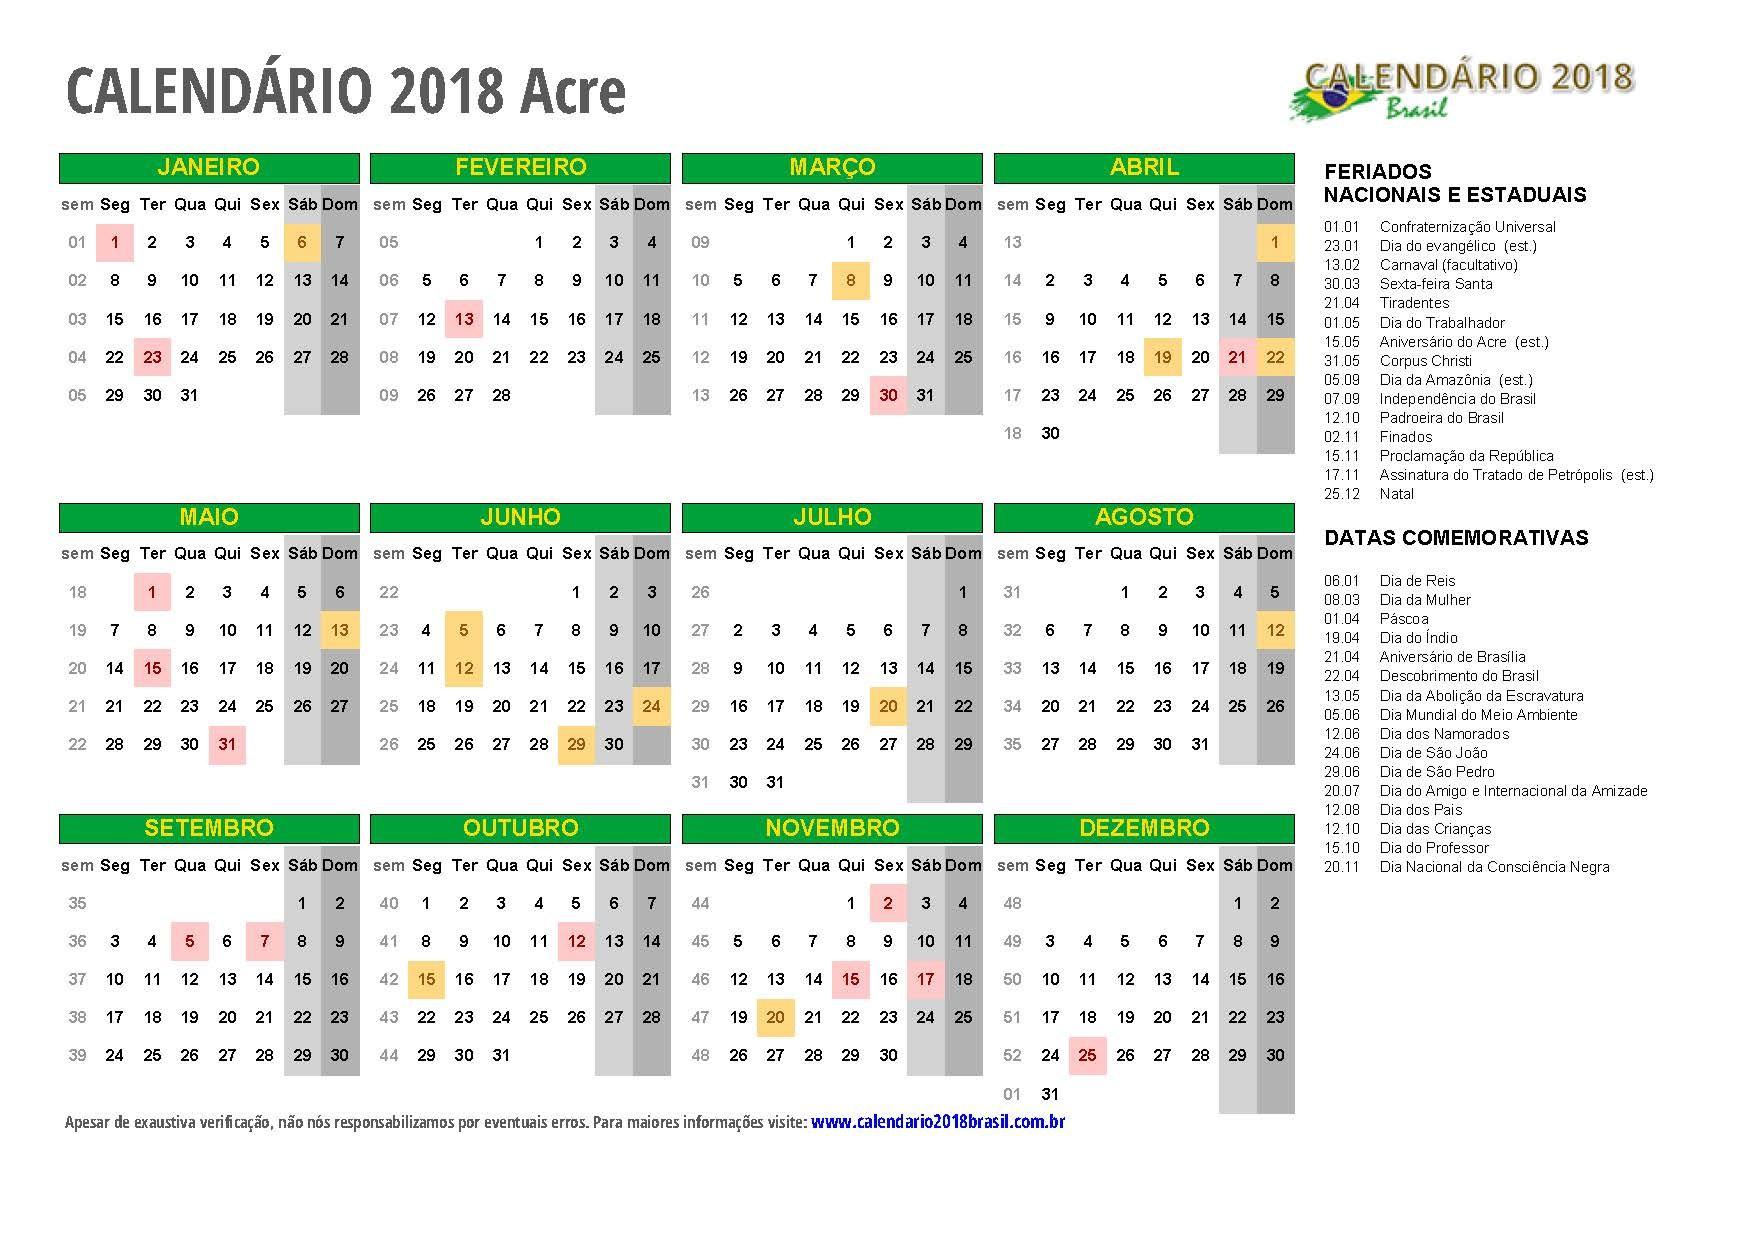 Calendario Dezembro 2017 Para Imprimir Word Más Arriba-a-fecha Calendrio 2018 Para Imprimir Feriados Of Calendario Dezembro 2017 Para Imprimir Word Más Actual Calendario 2017 Feriados Bahia Calendrier